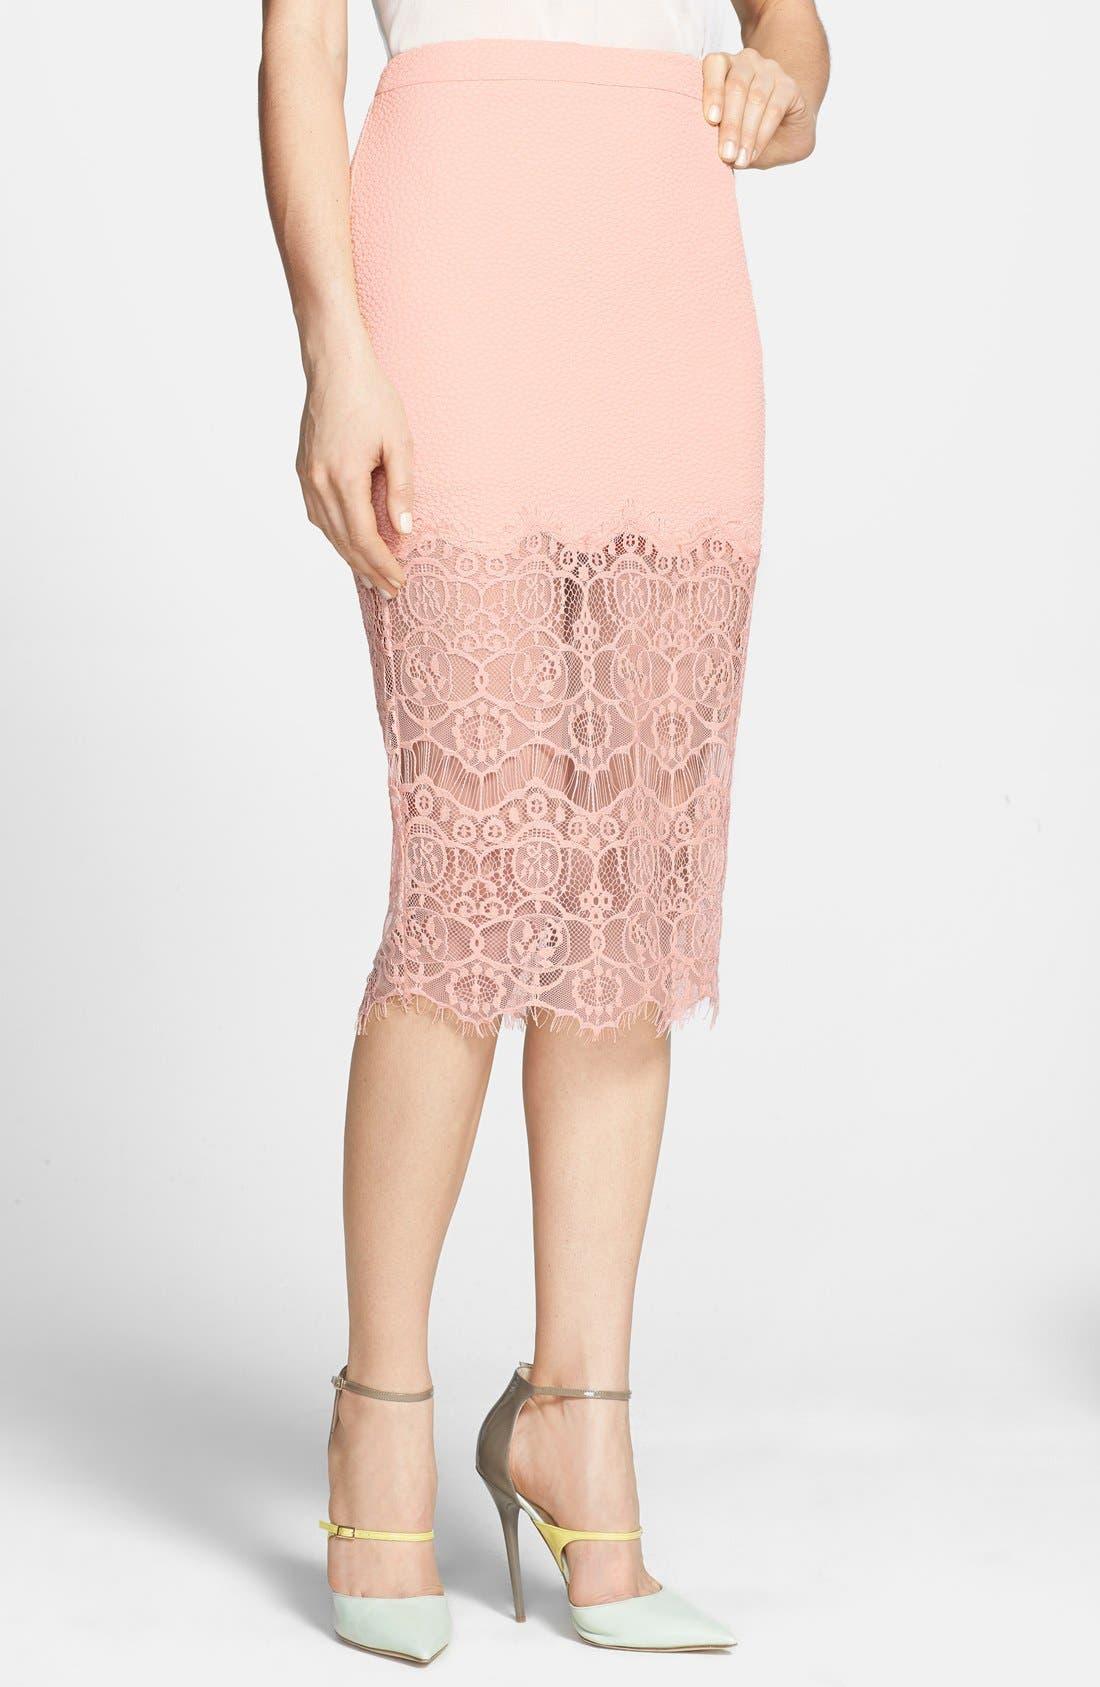 Alternate Image 1 Selected - ASTR Textured Lace Hem Pencil Skirt